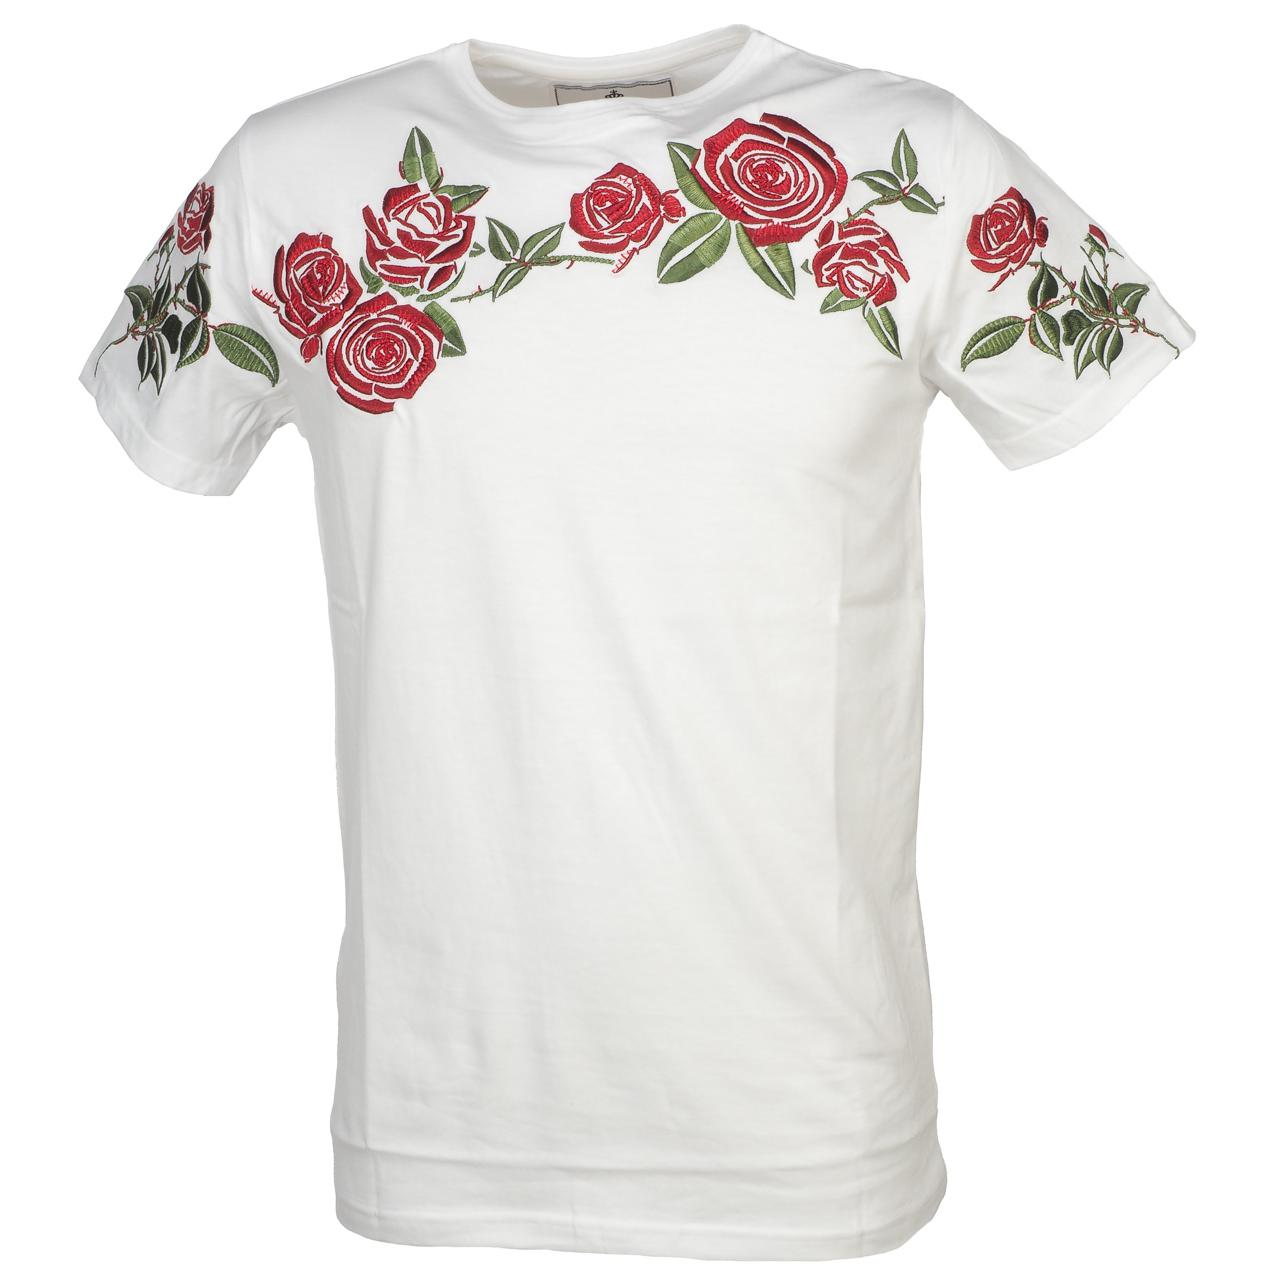 Short-Hite-Couture-Madiner-White-Mc-Tee-White-11526-New